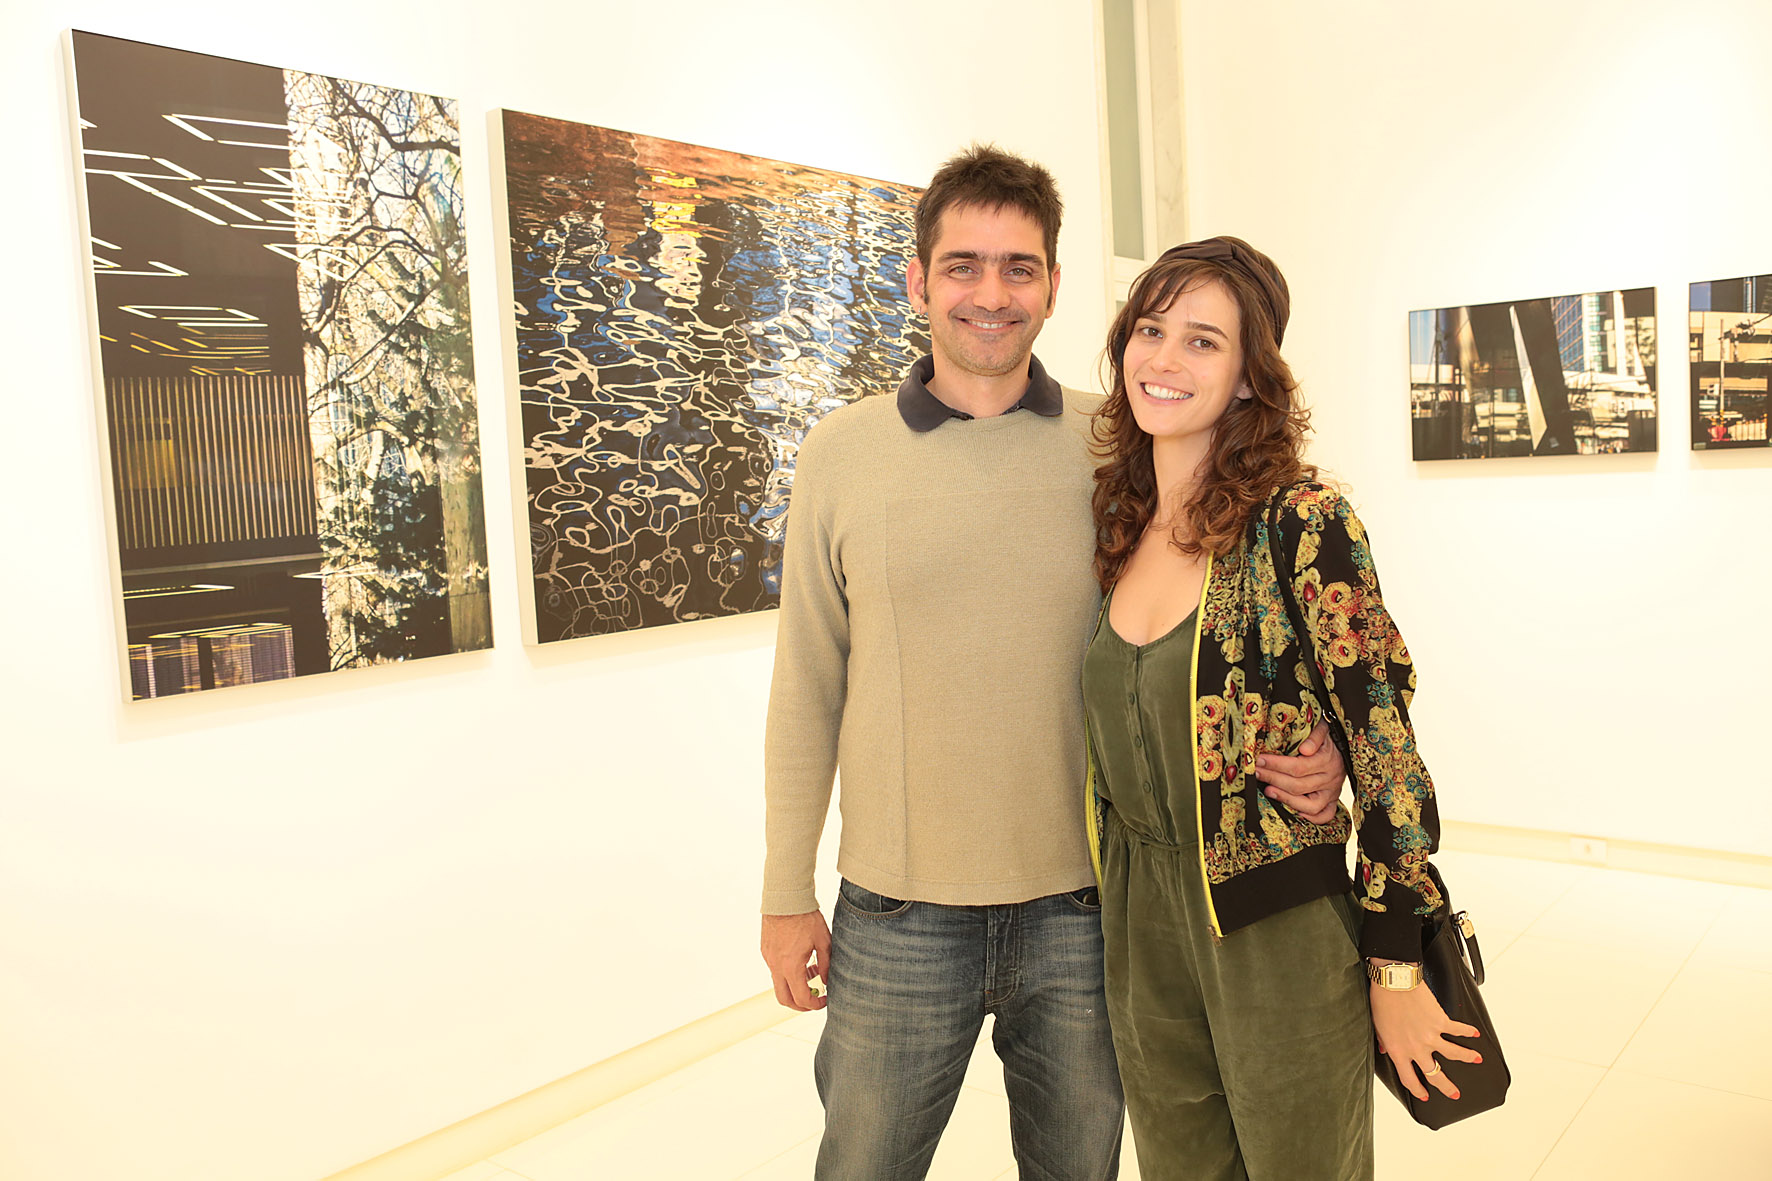 Vinicius Coimbra e Priscila Steinman_AGi9_Reginaldo Teixeira_p